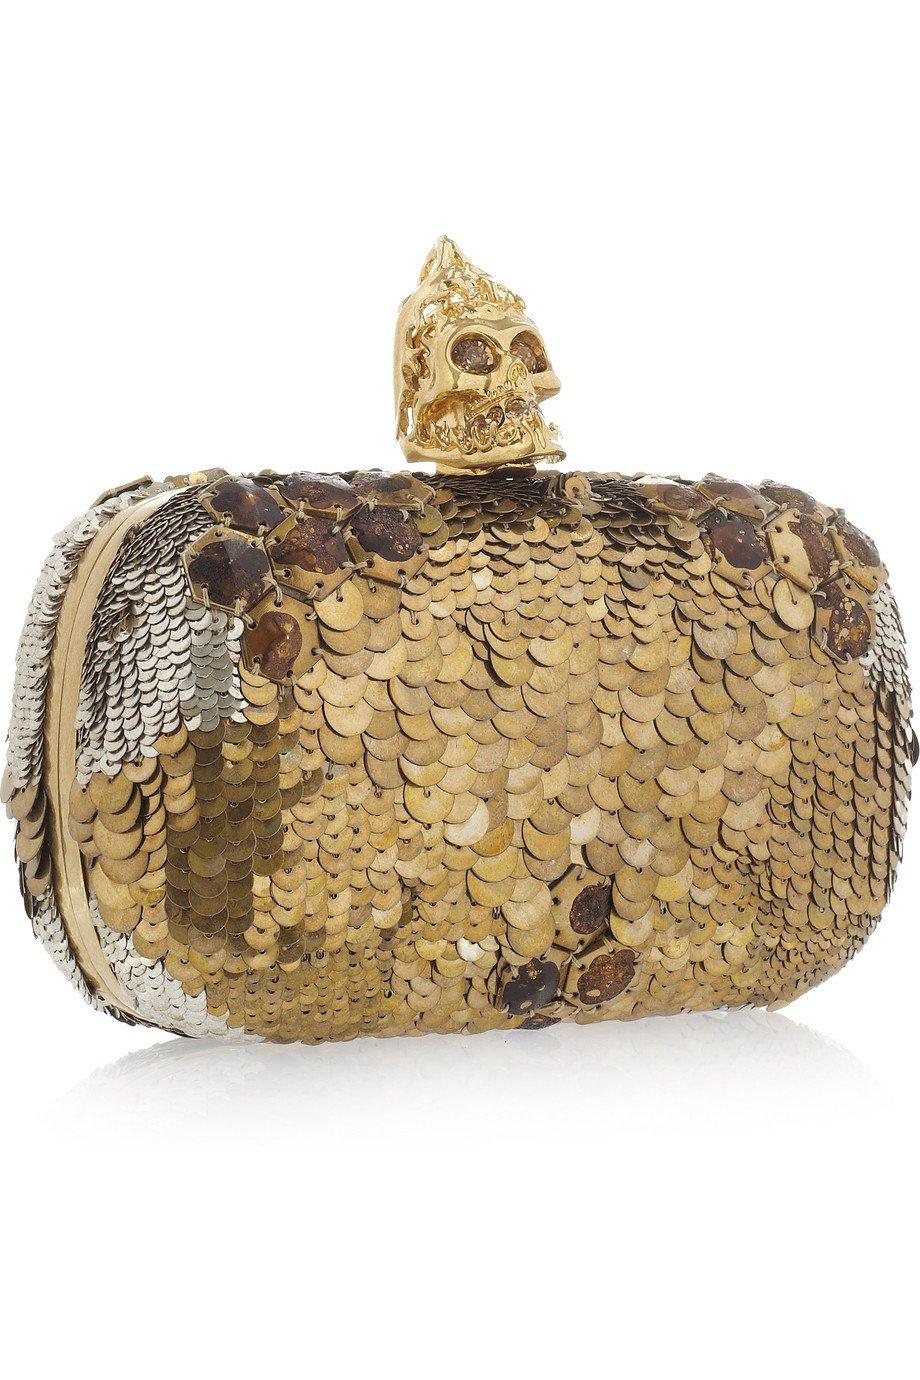 Alexander mcqueen sequin skull box clutch in metallic lyst for Tj maxx jewelry box